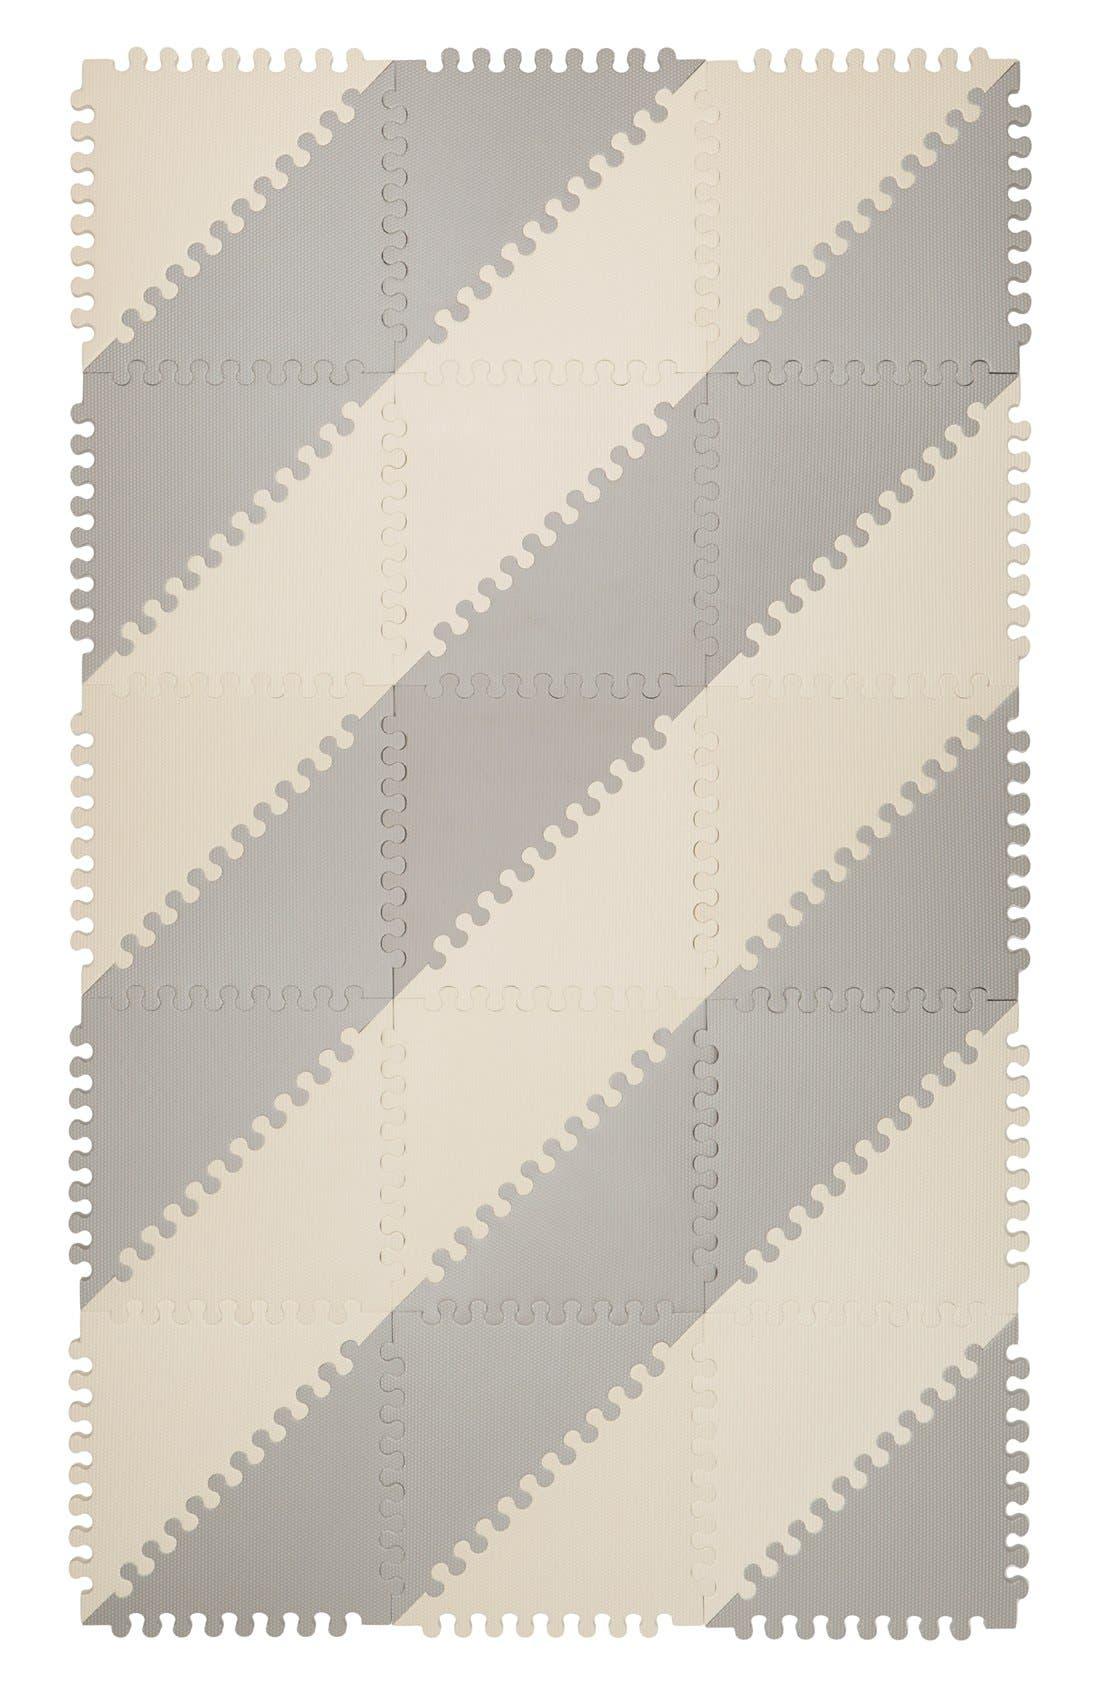 Alternate Image 1 Selected - Skip Hop 'PLAYSPOTS' Foam Floor Tiles